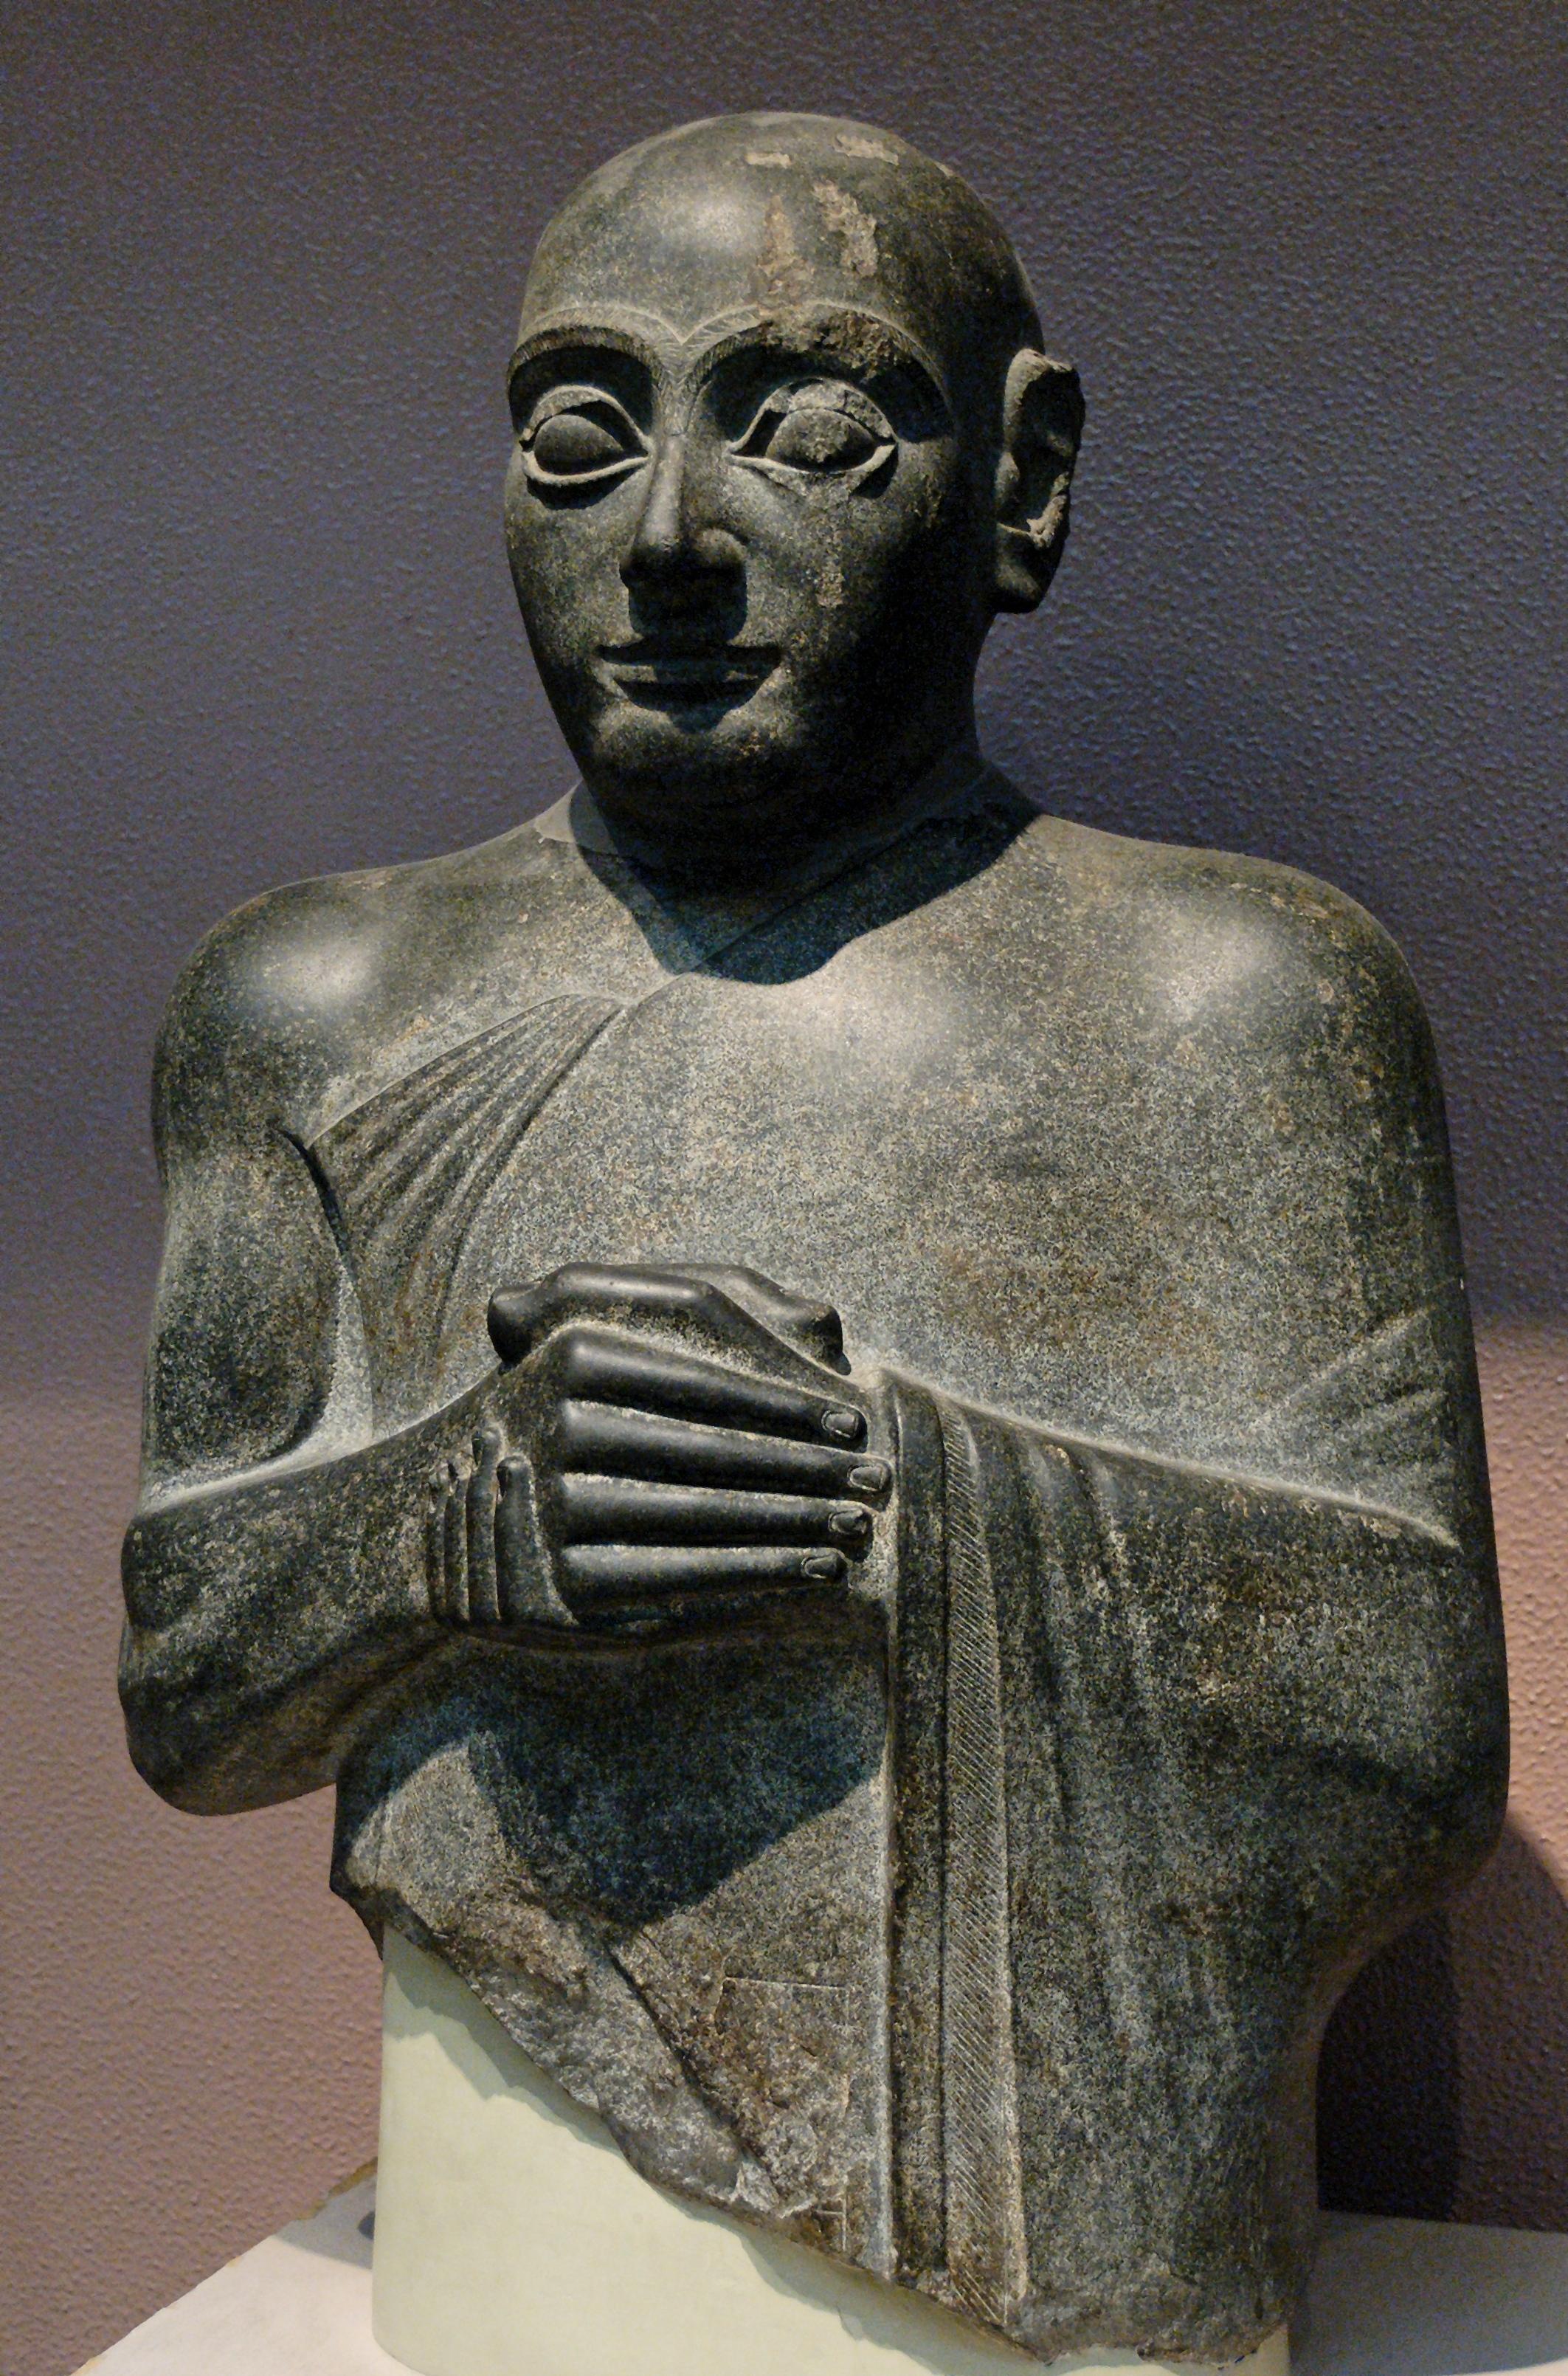 https://upload.wikimedia.org/wikipedia/commons/c/c7/Statue_Gudea_BM_WA122910.jpg